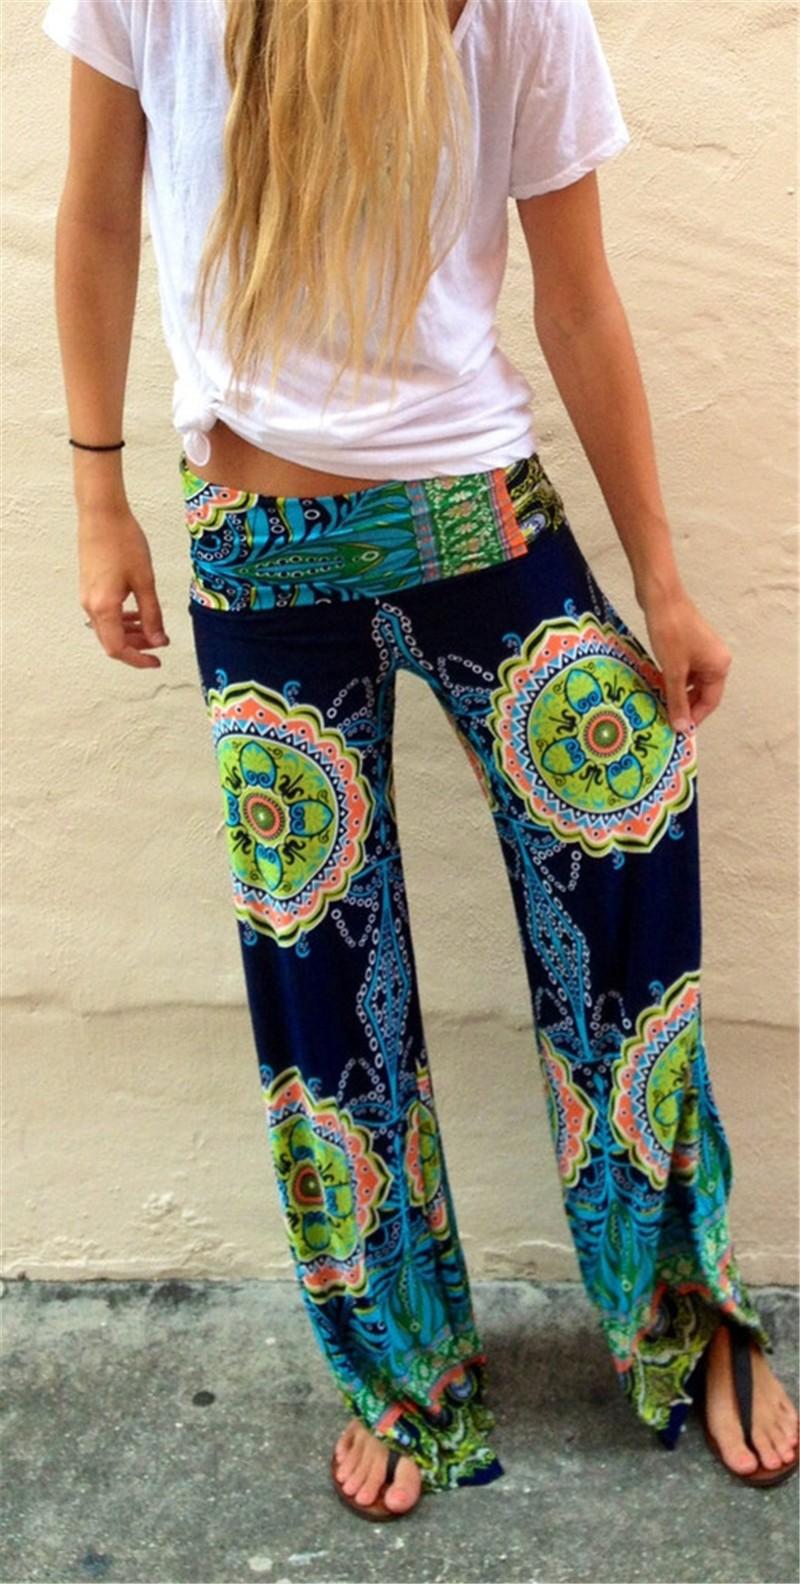 2015-New-Summer-Women-Pants-Casual-Wide-Leg-Long-Pants-Plus-Size-Floral-Printed-Trousers-c3382